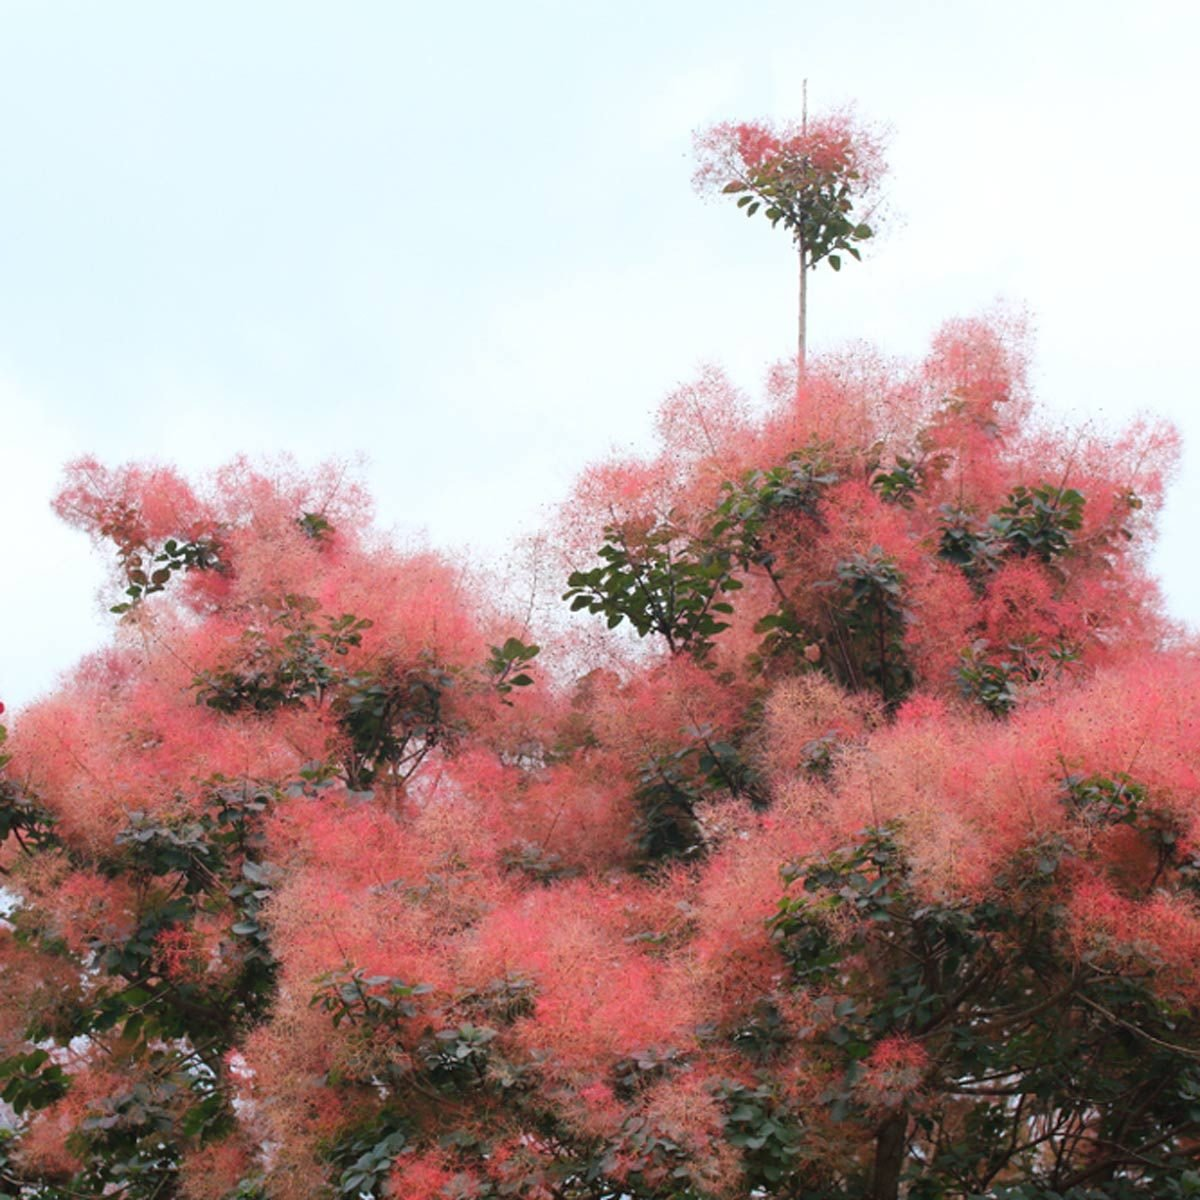 flowering shrubs Smokelike blooms on smokebush shrub